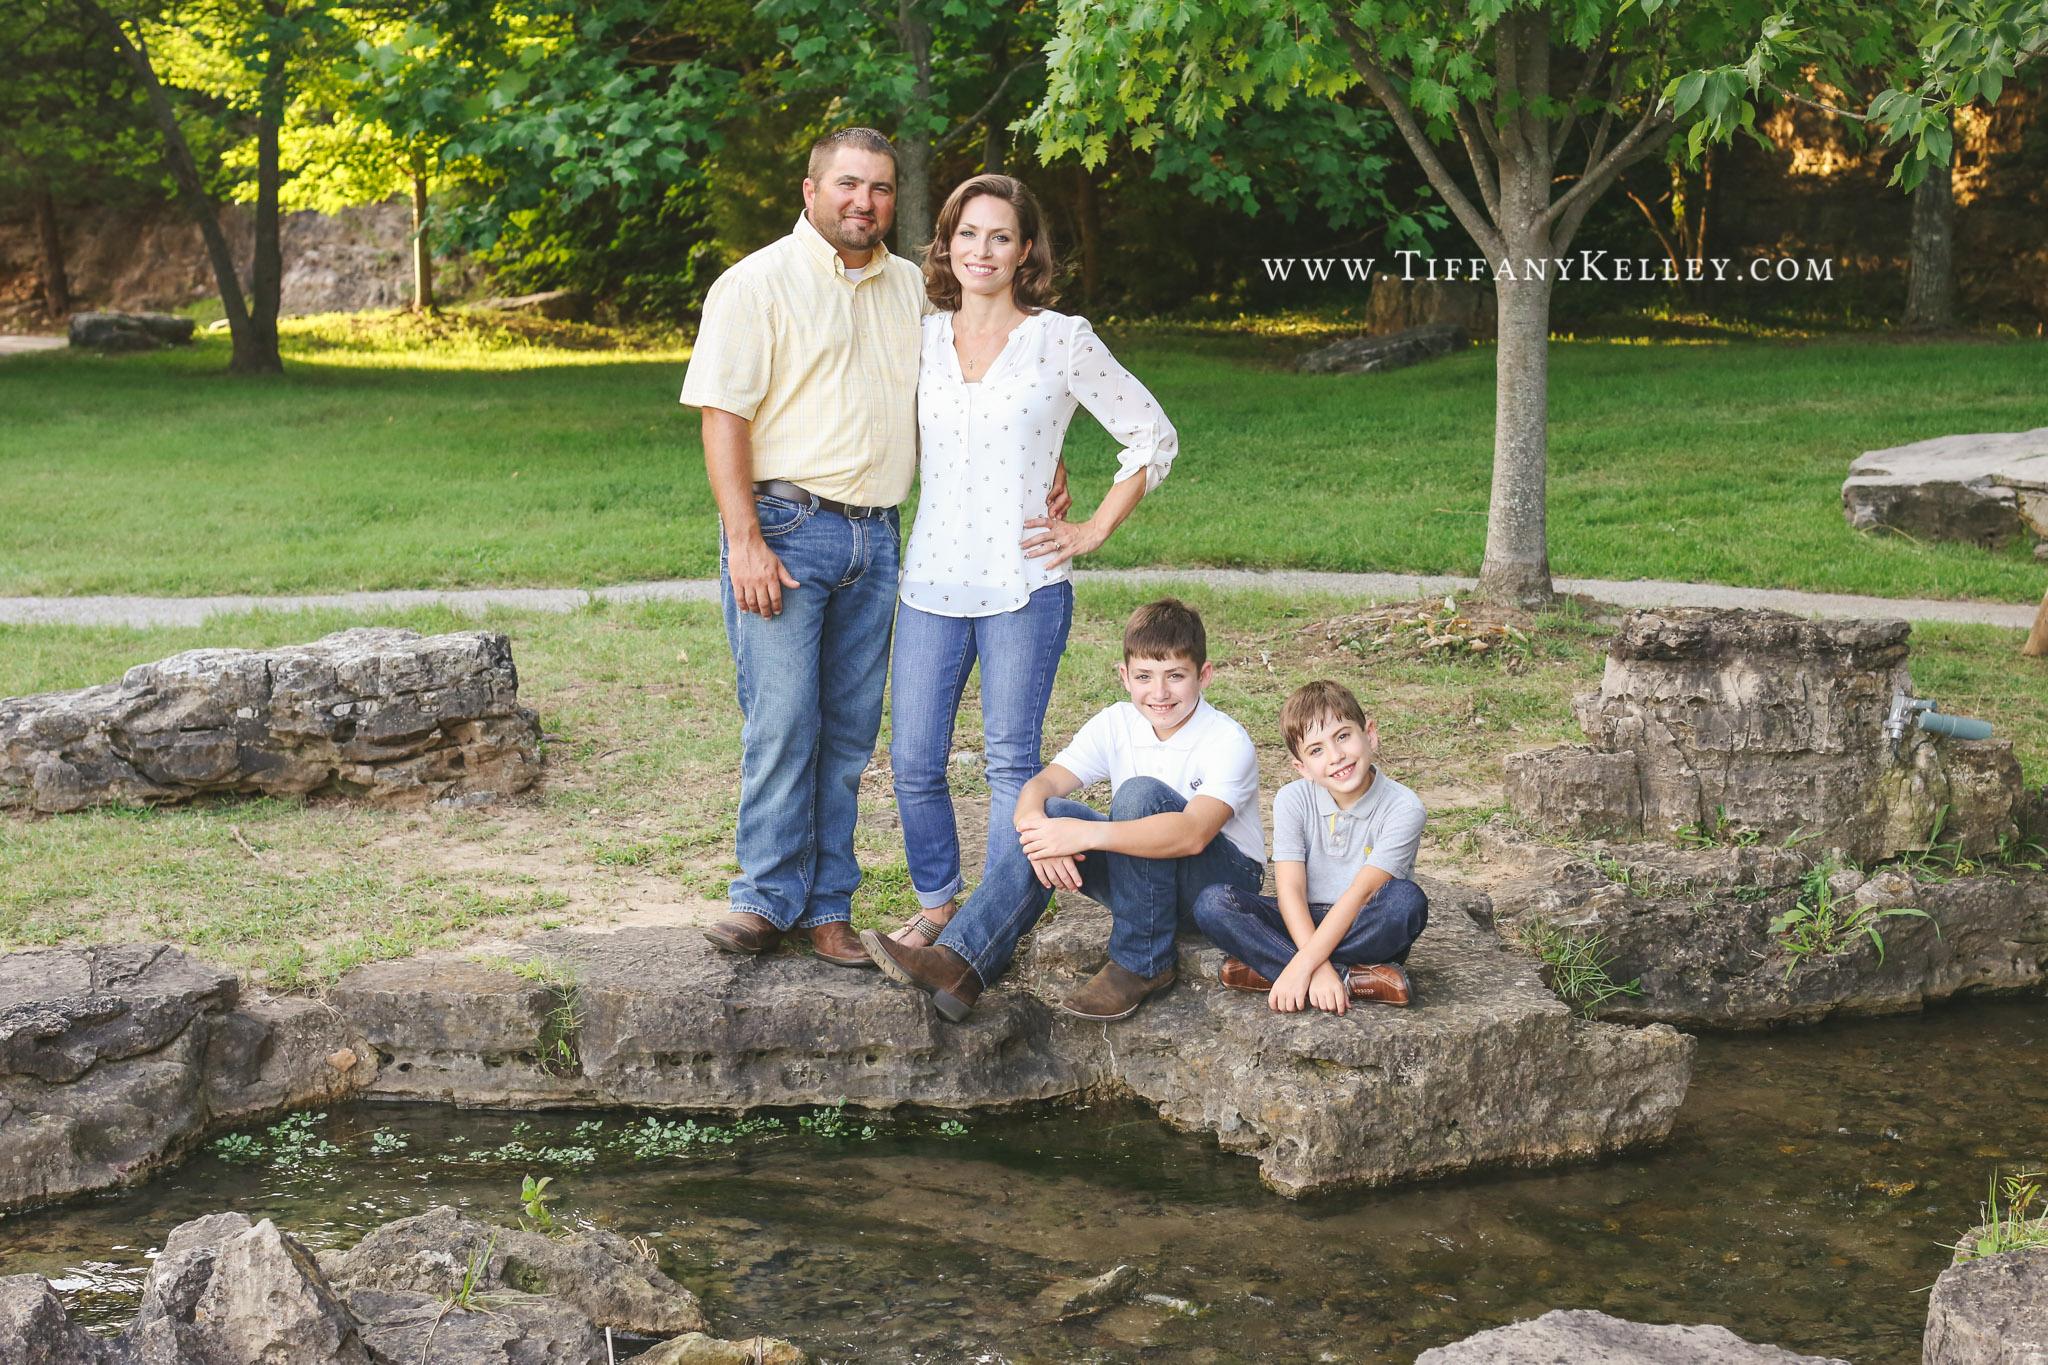 09 Big Cedar Lodge Photographer - Branson MO Family Photographer - Tiffany Kelley Photography